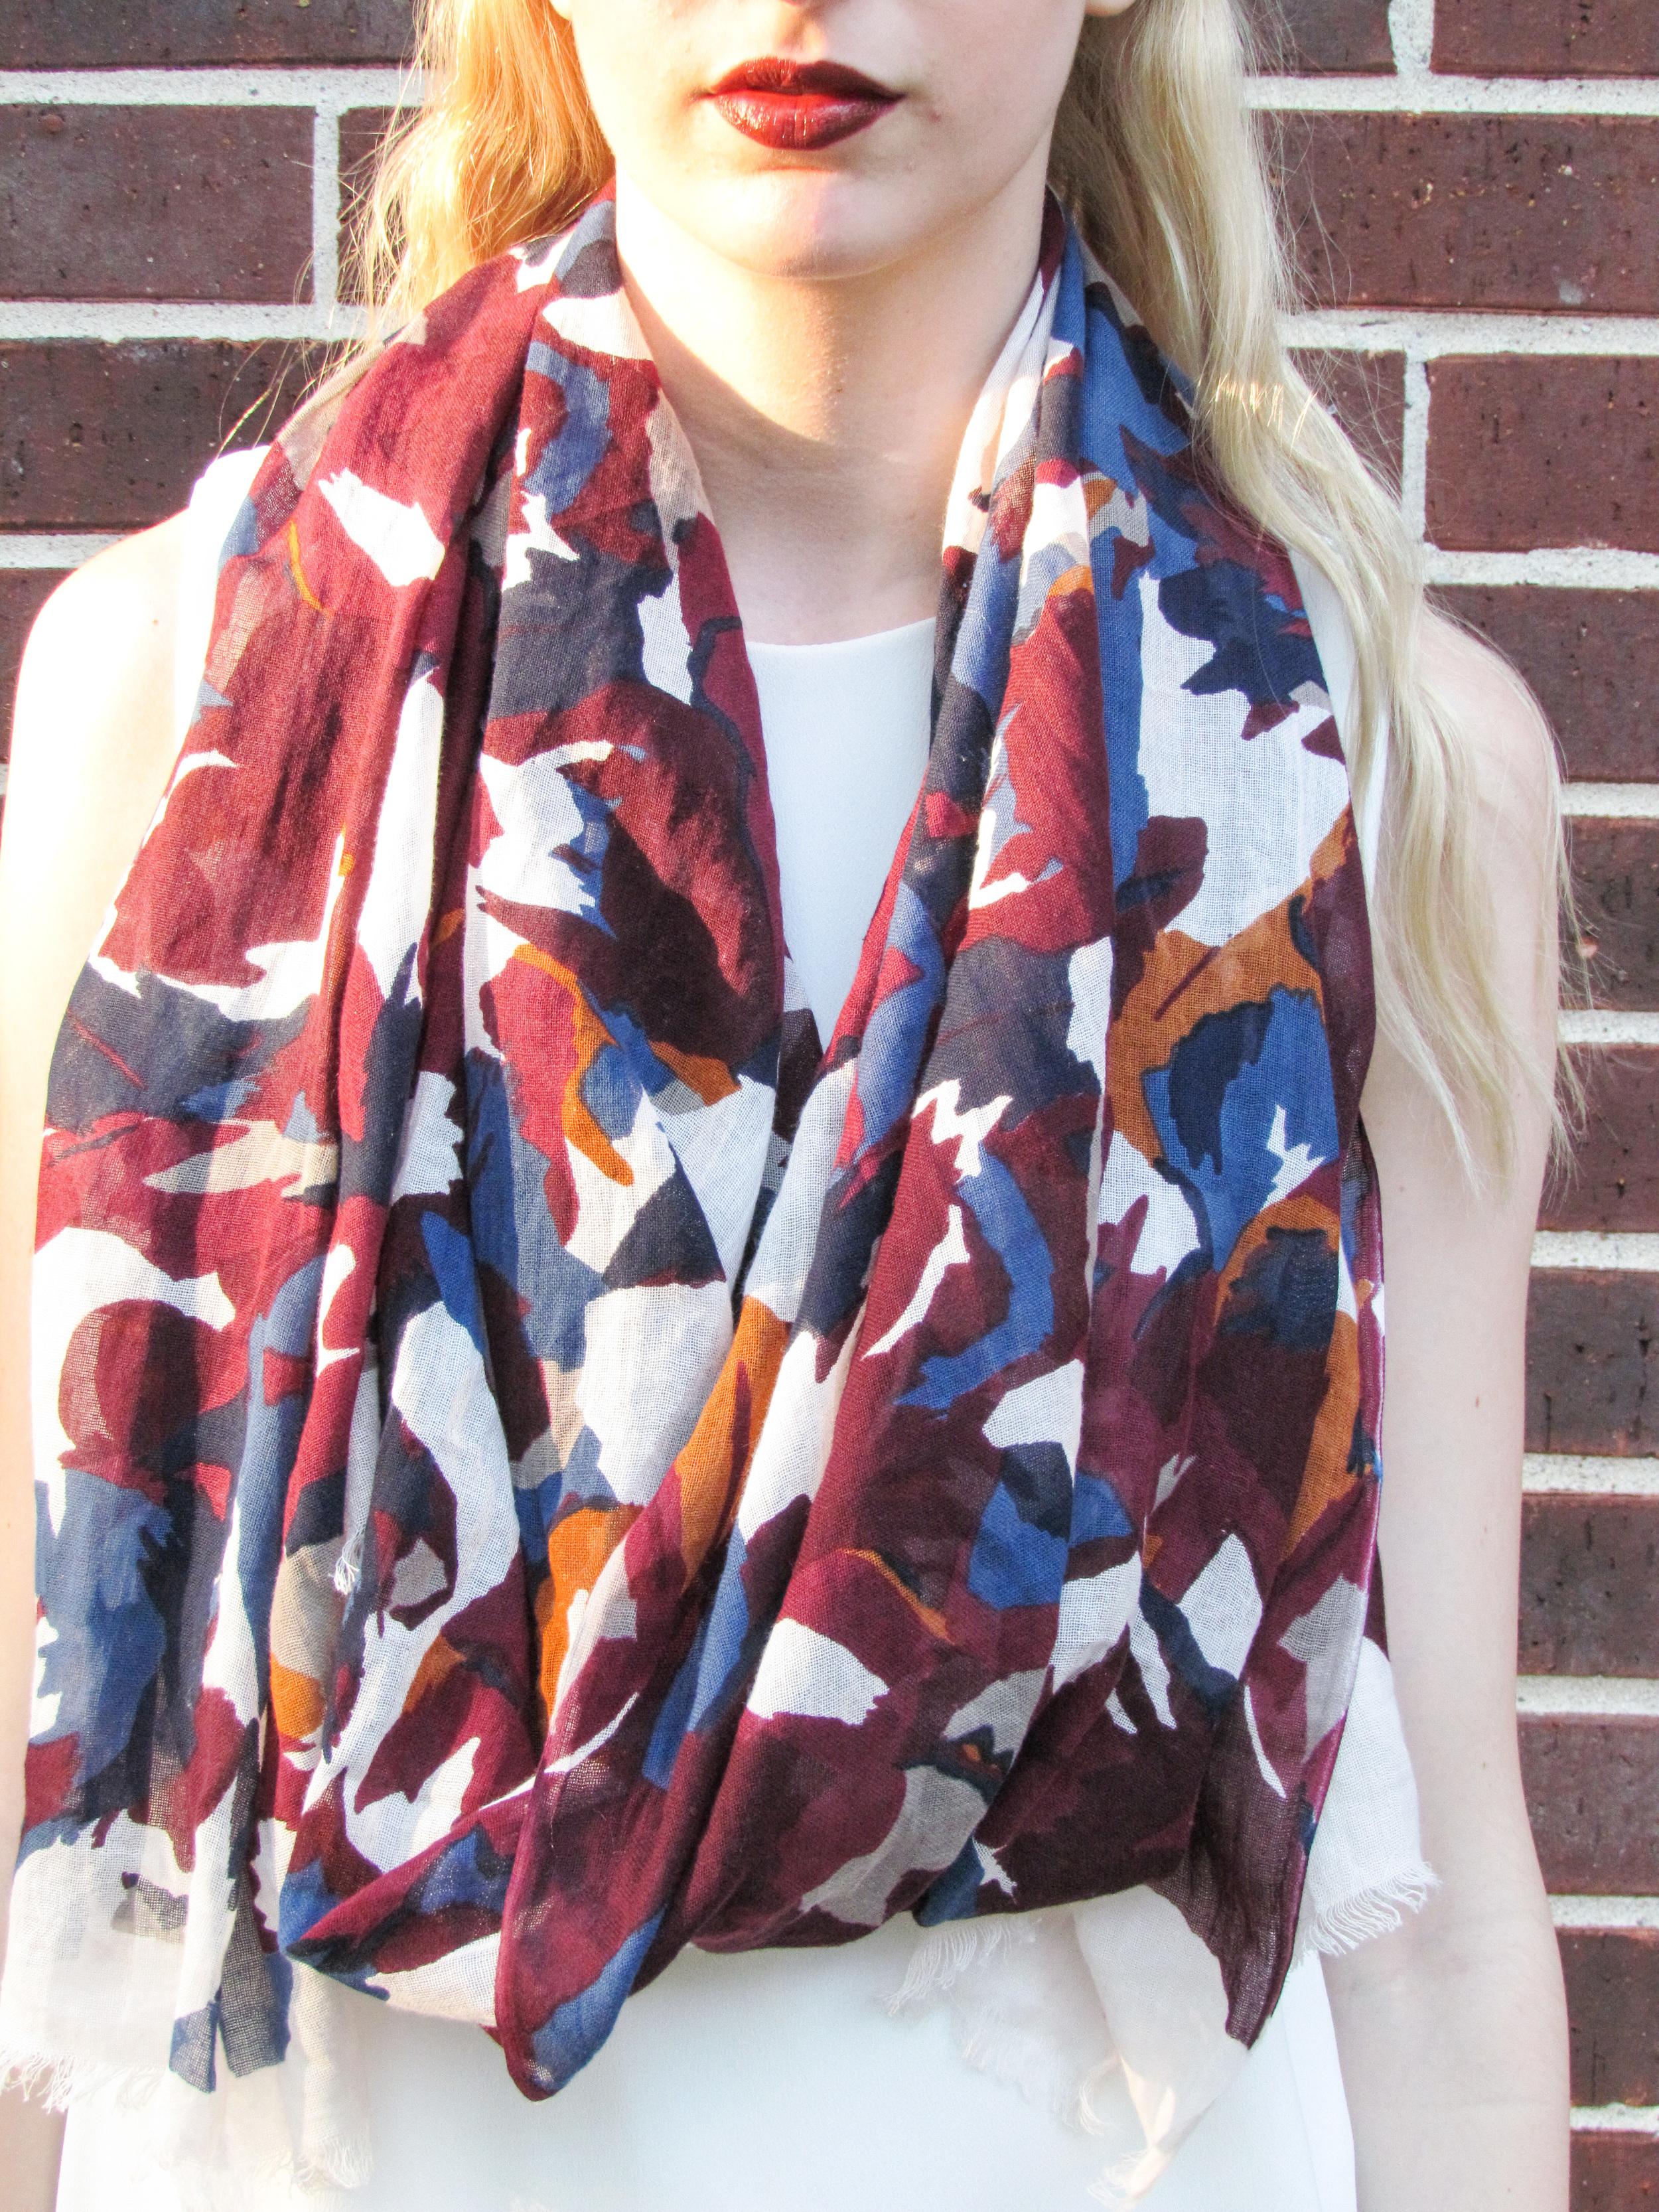 Zara white shift dress, loft watercolor floral scarf, clinique cola pop lipstick, loft pointed toe d'orsay flats